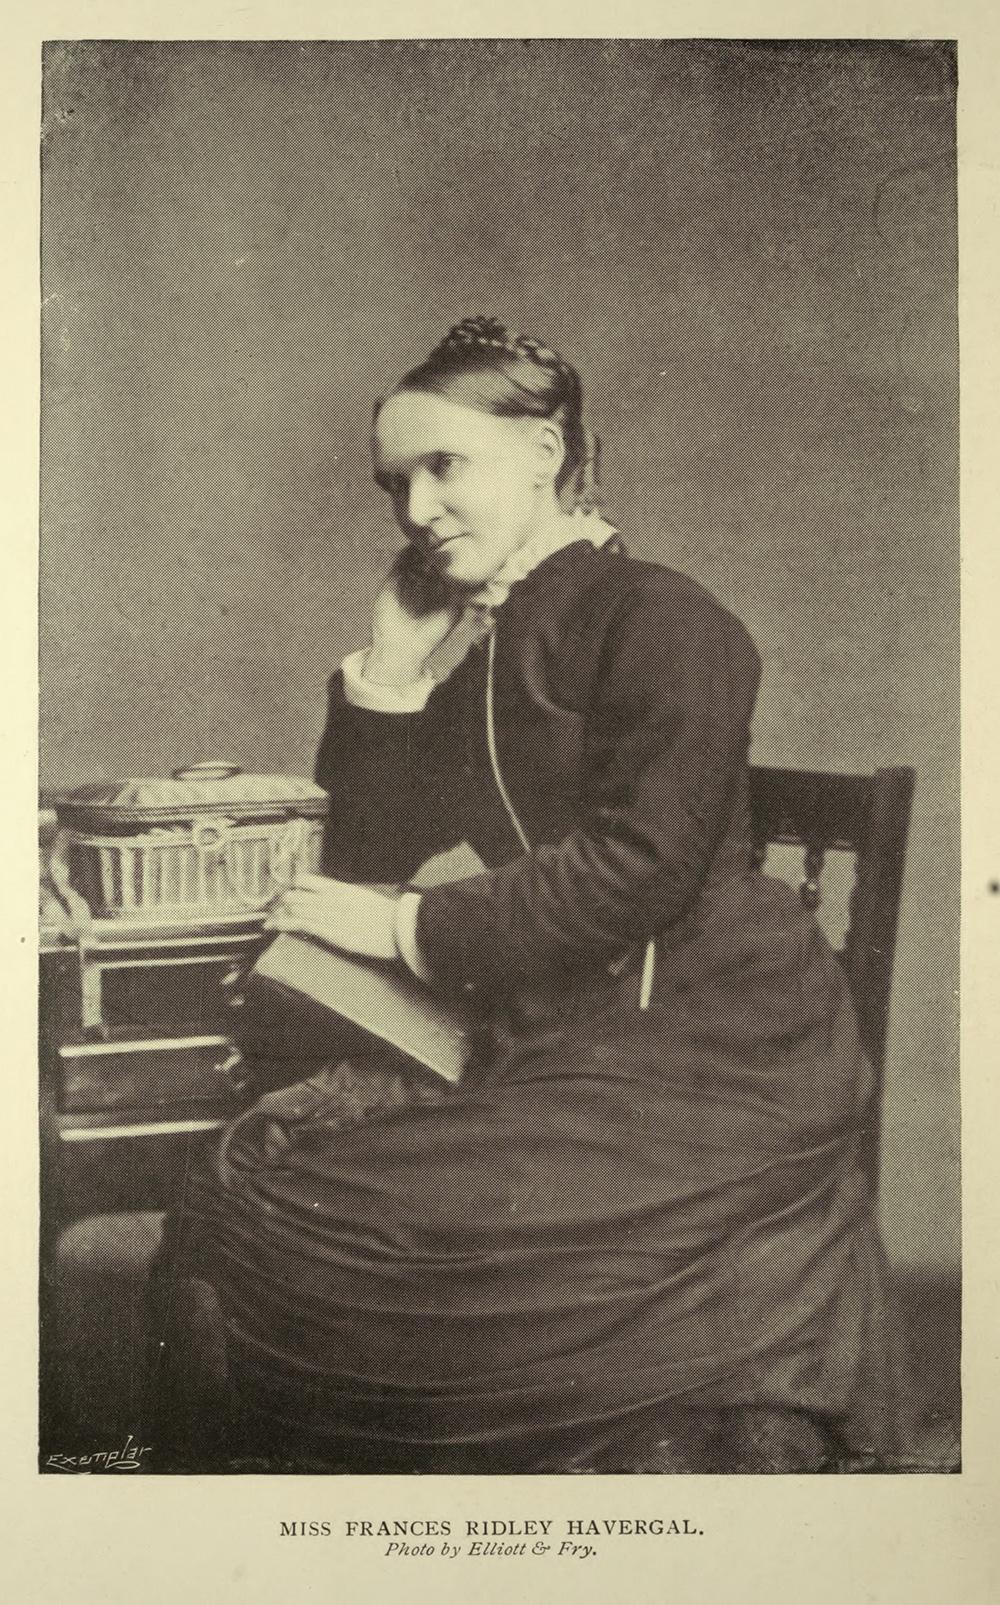 Frances Ridley Havergal , in Francis Arthur Jones,  Famous Hymns and Their Authors  (London: Hodder & Stoughton, 1902).